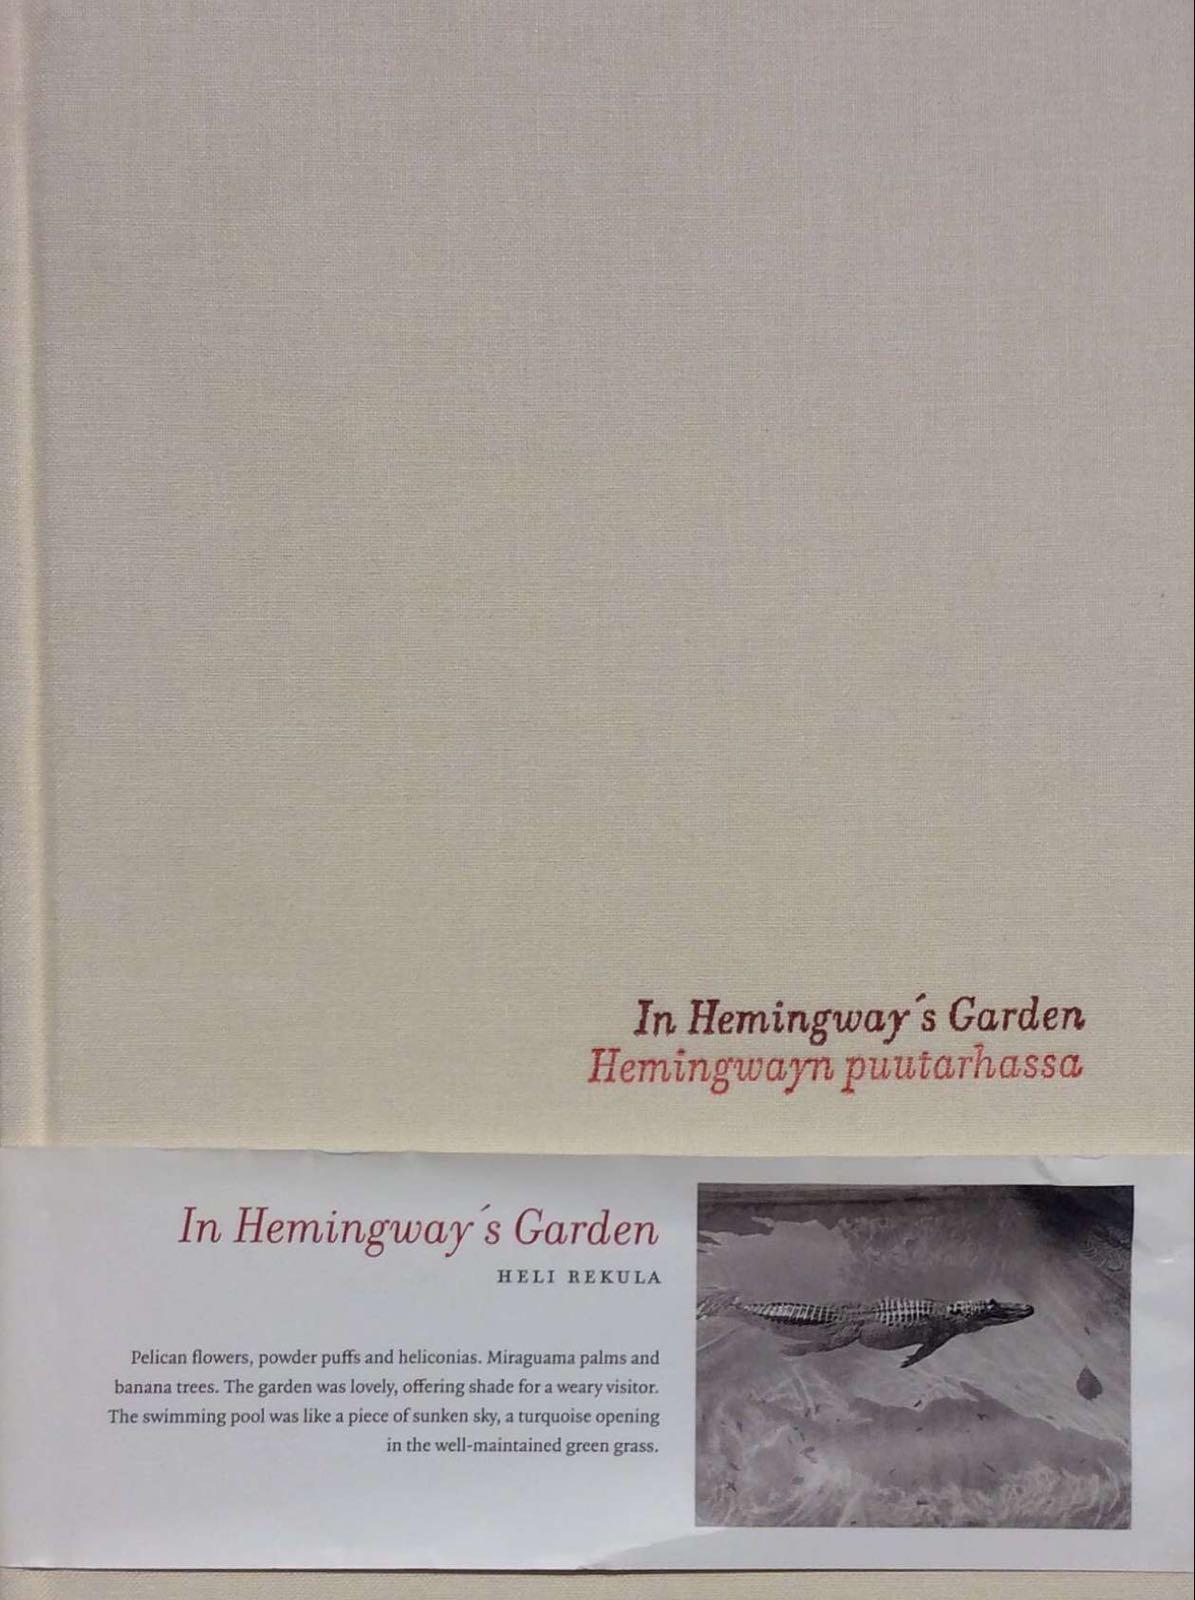 Rekula, Heli. In Hemingway's Garden